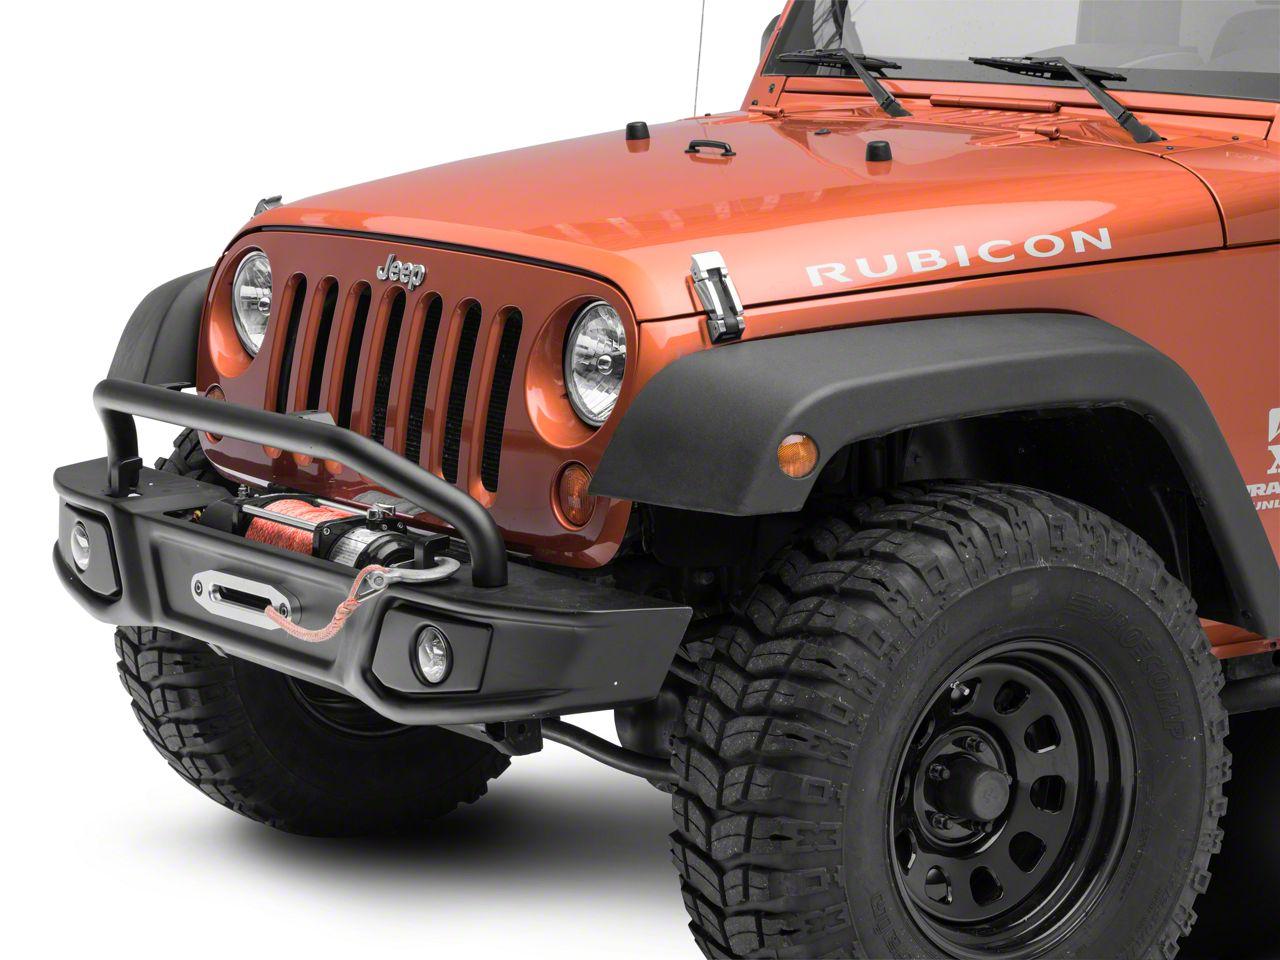 Barricade Cruiser HD Front Bumper w/ Over Rider & LED Fog Lights (07-18 Jeep Wrangler JK)